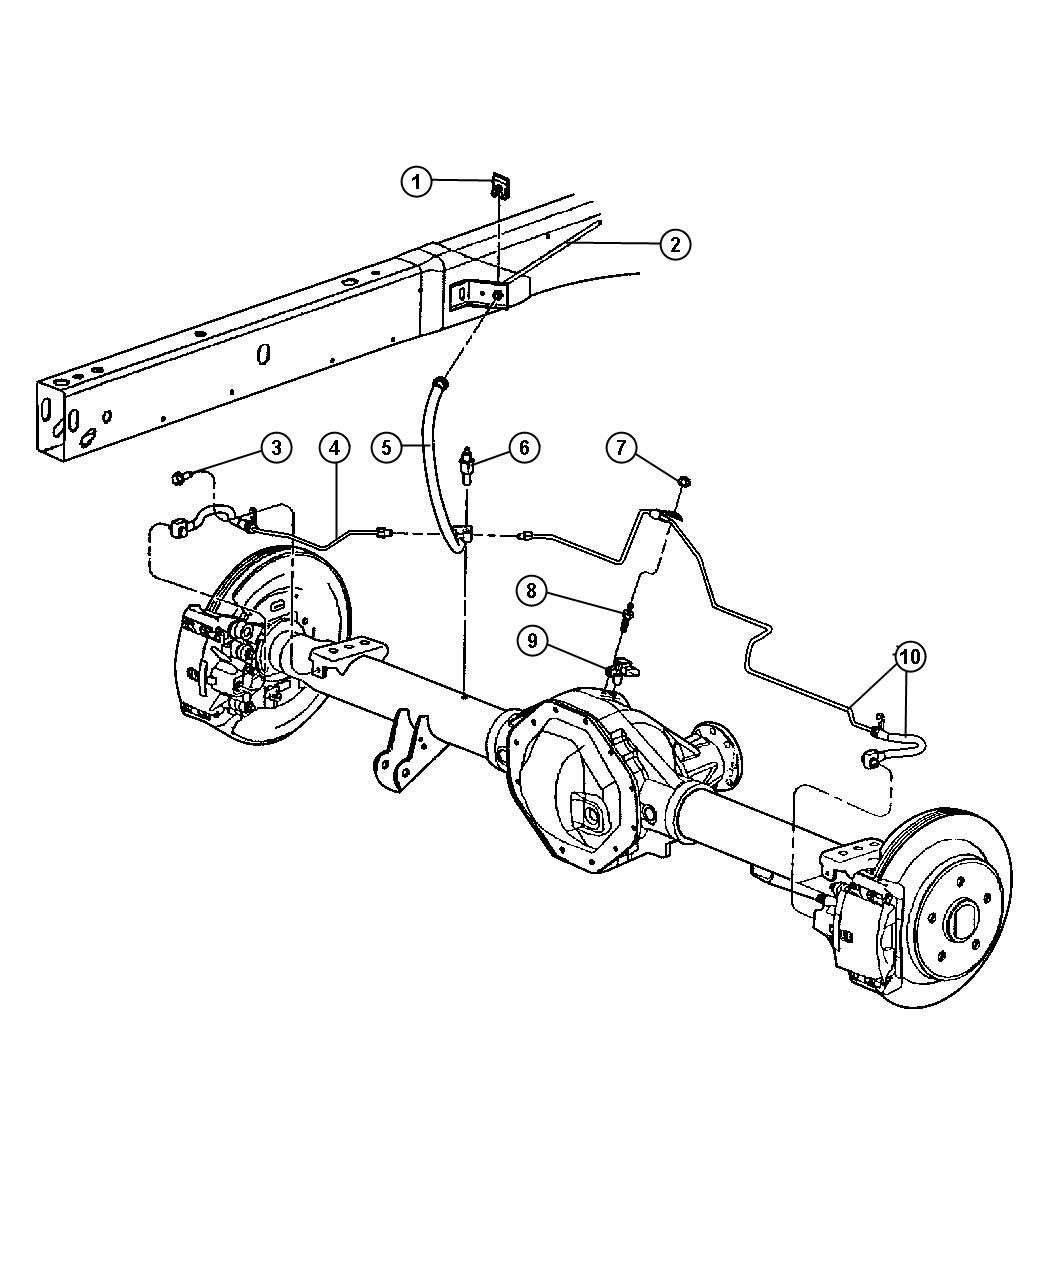 297 2007 Dodge Ram 3500 Fuse Box Wiring Diagram Library